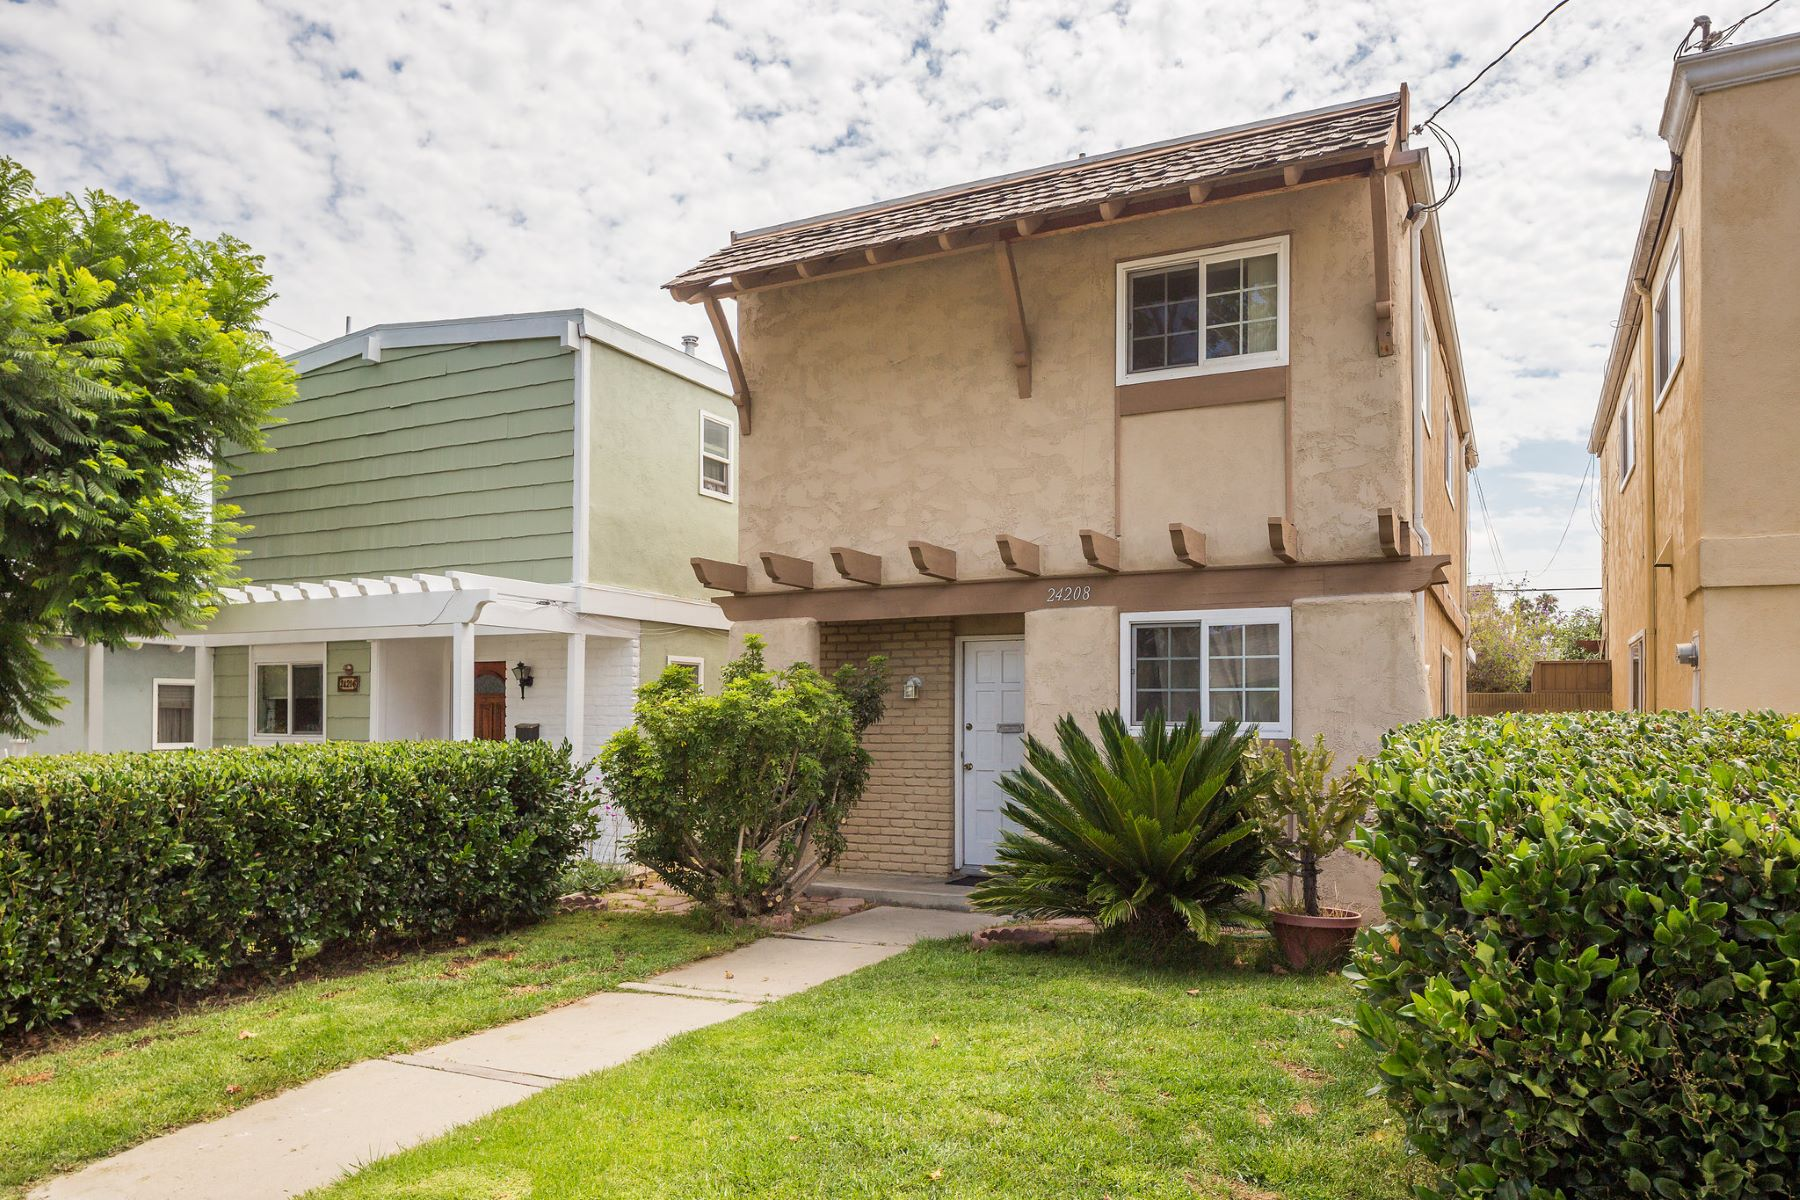 Villa per Vendita alle ore 24208 Park St, Torrance 90505 24208 Park Street Torrance, California, 90505 Stati Uniti